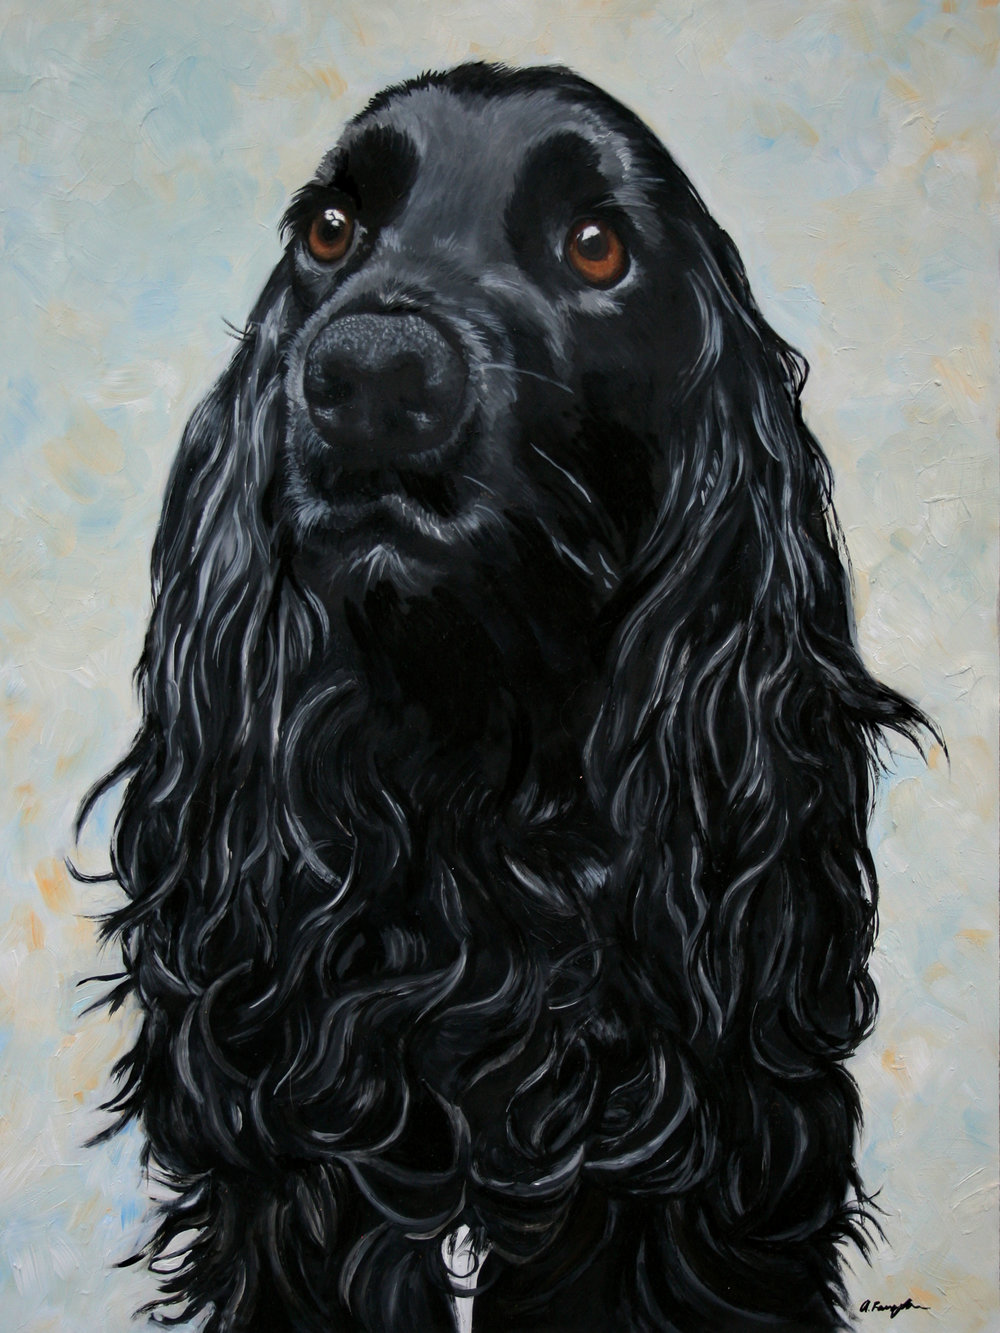 Clarke. Cropped View of Original Pet Portrait Commission - 12 x 16 oil on panel